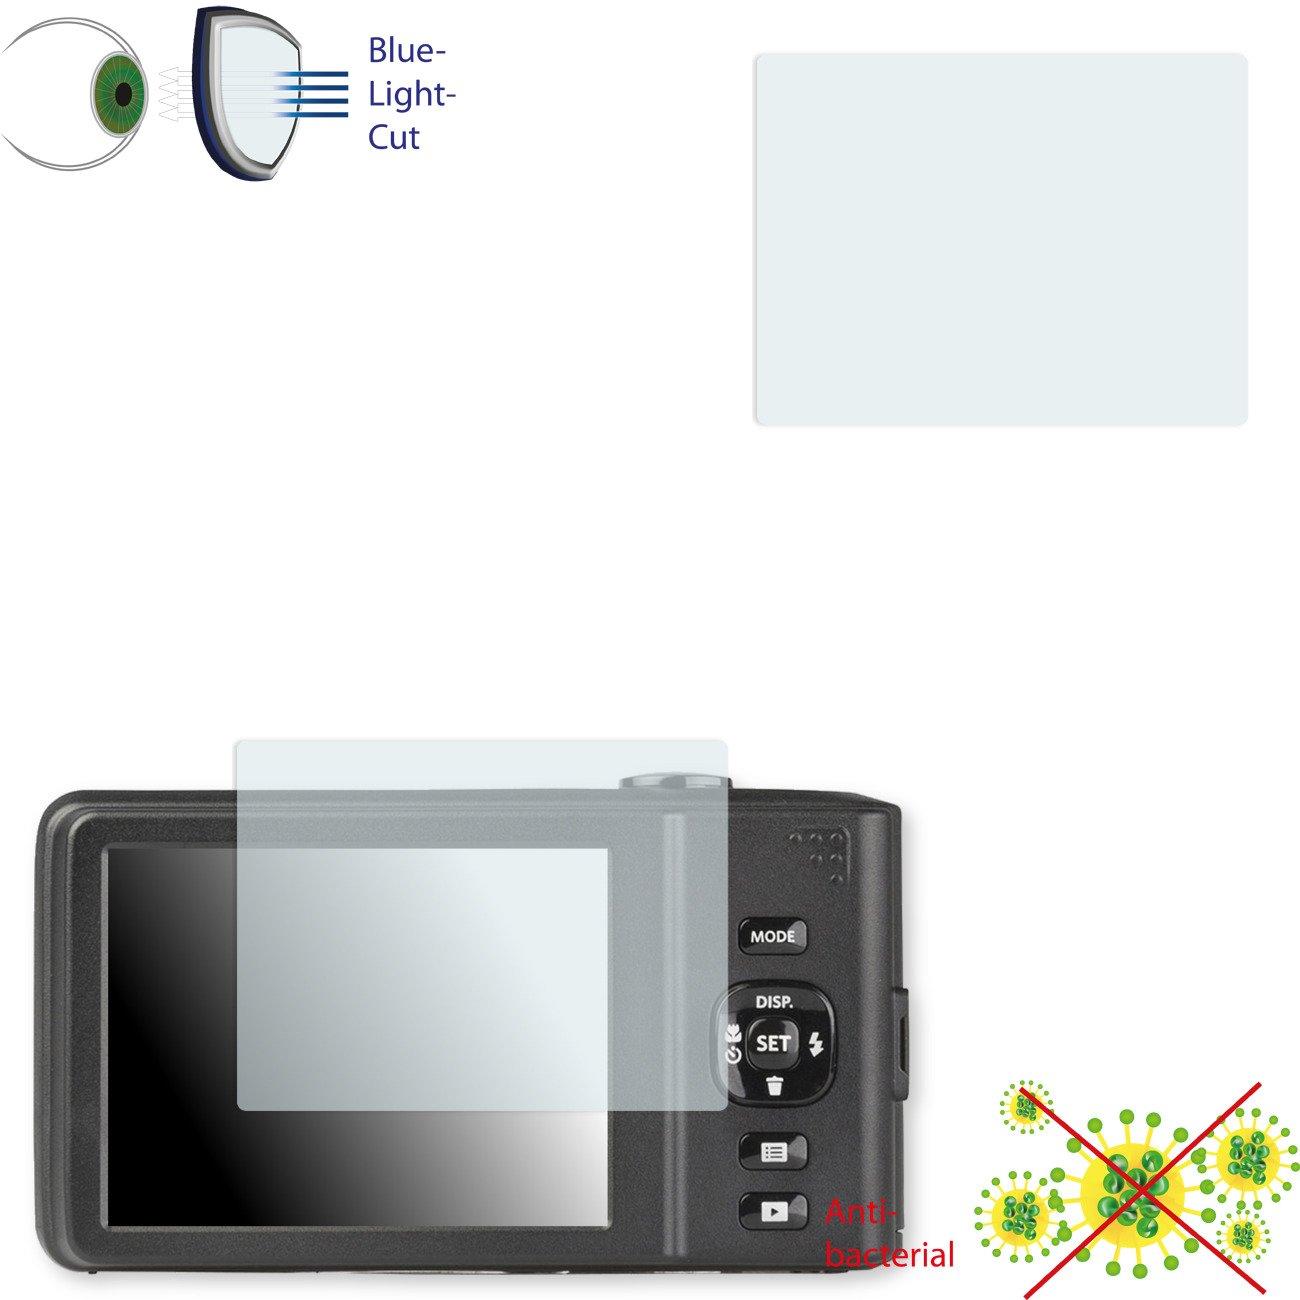 2 x DISAGU 透明スクリーン保護フィルム、Kodak Pixpro FZ151抗菌、ブルーカット保護フィルム。   B0779RM79G